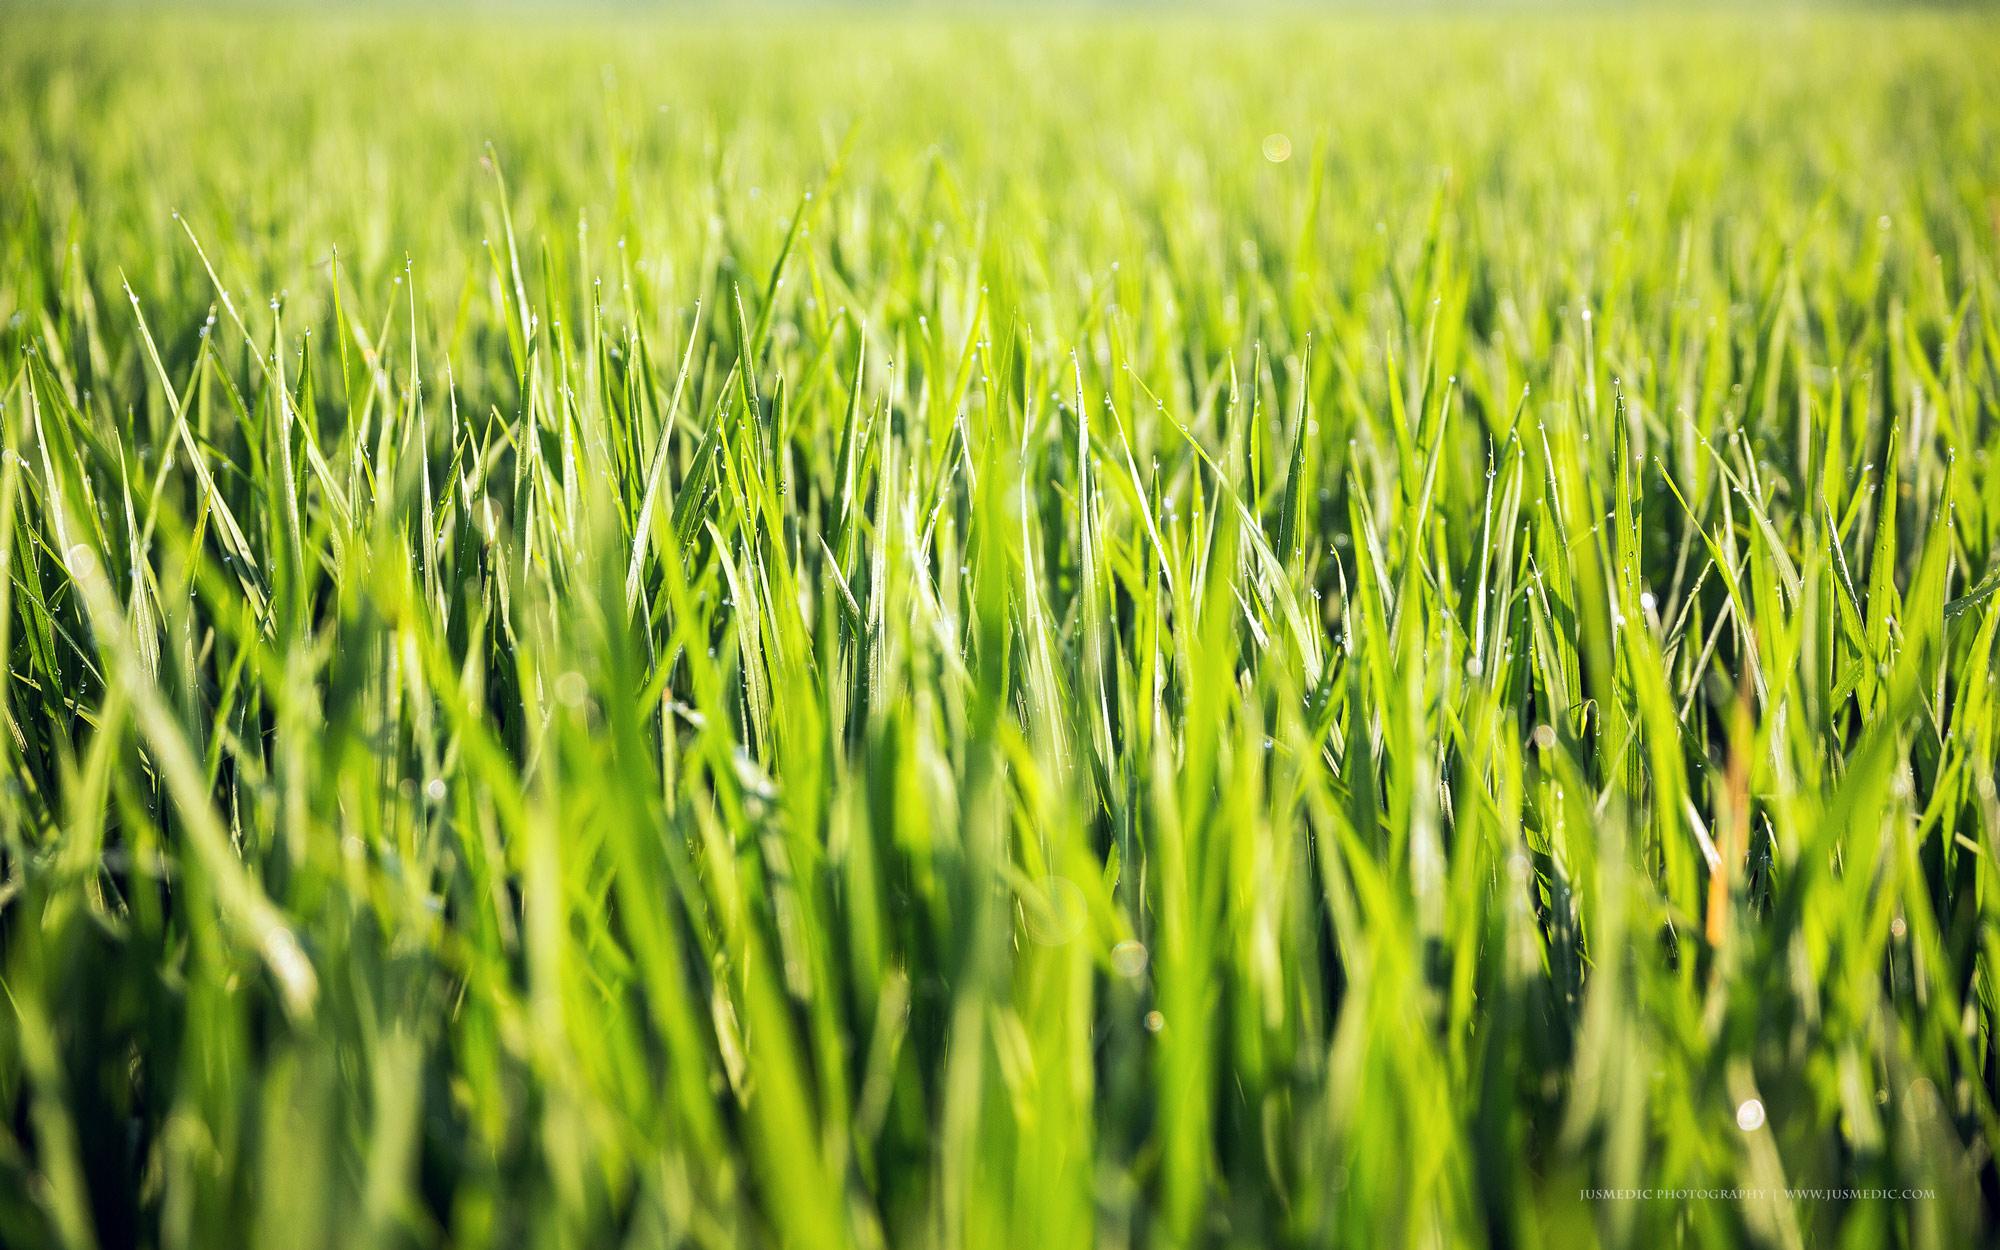 03-16-March-Rice-fields-jusmedic.com-2000px